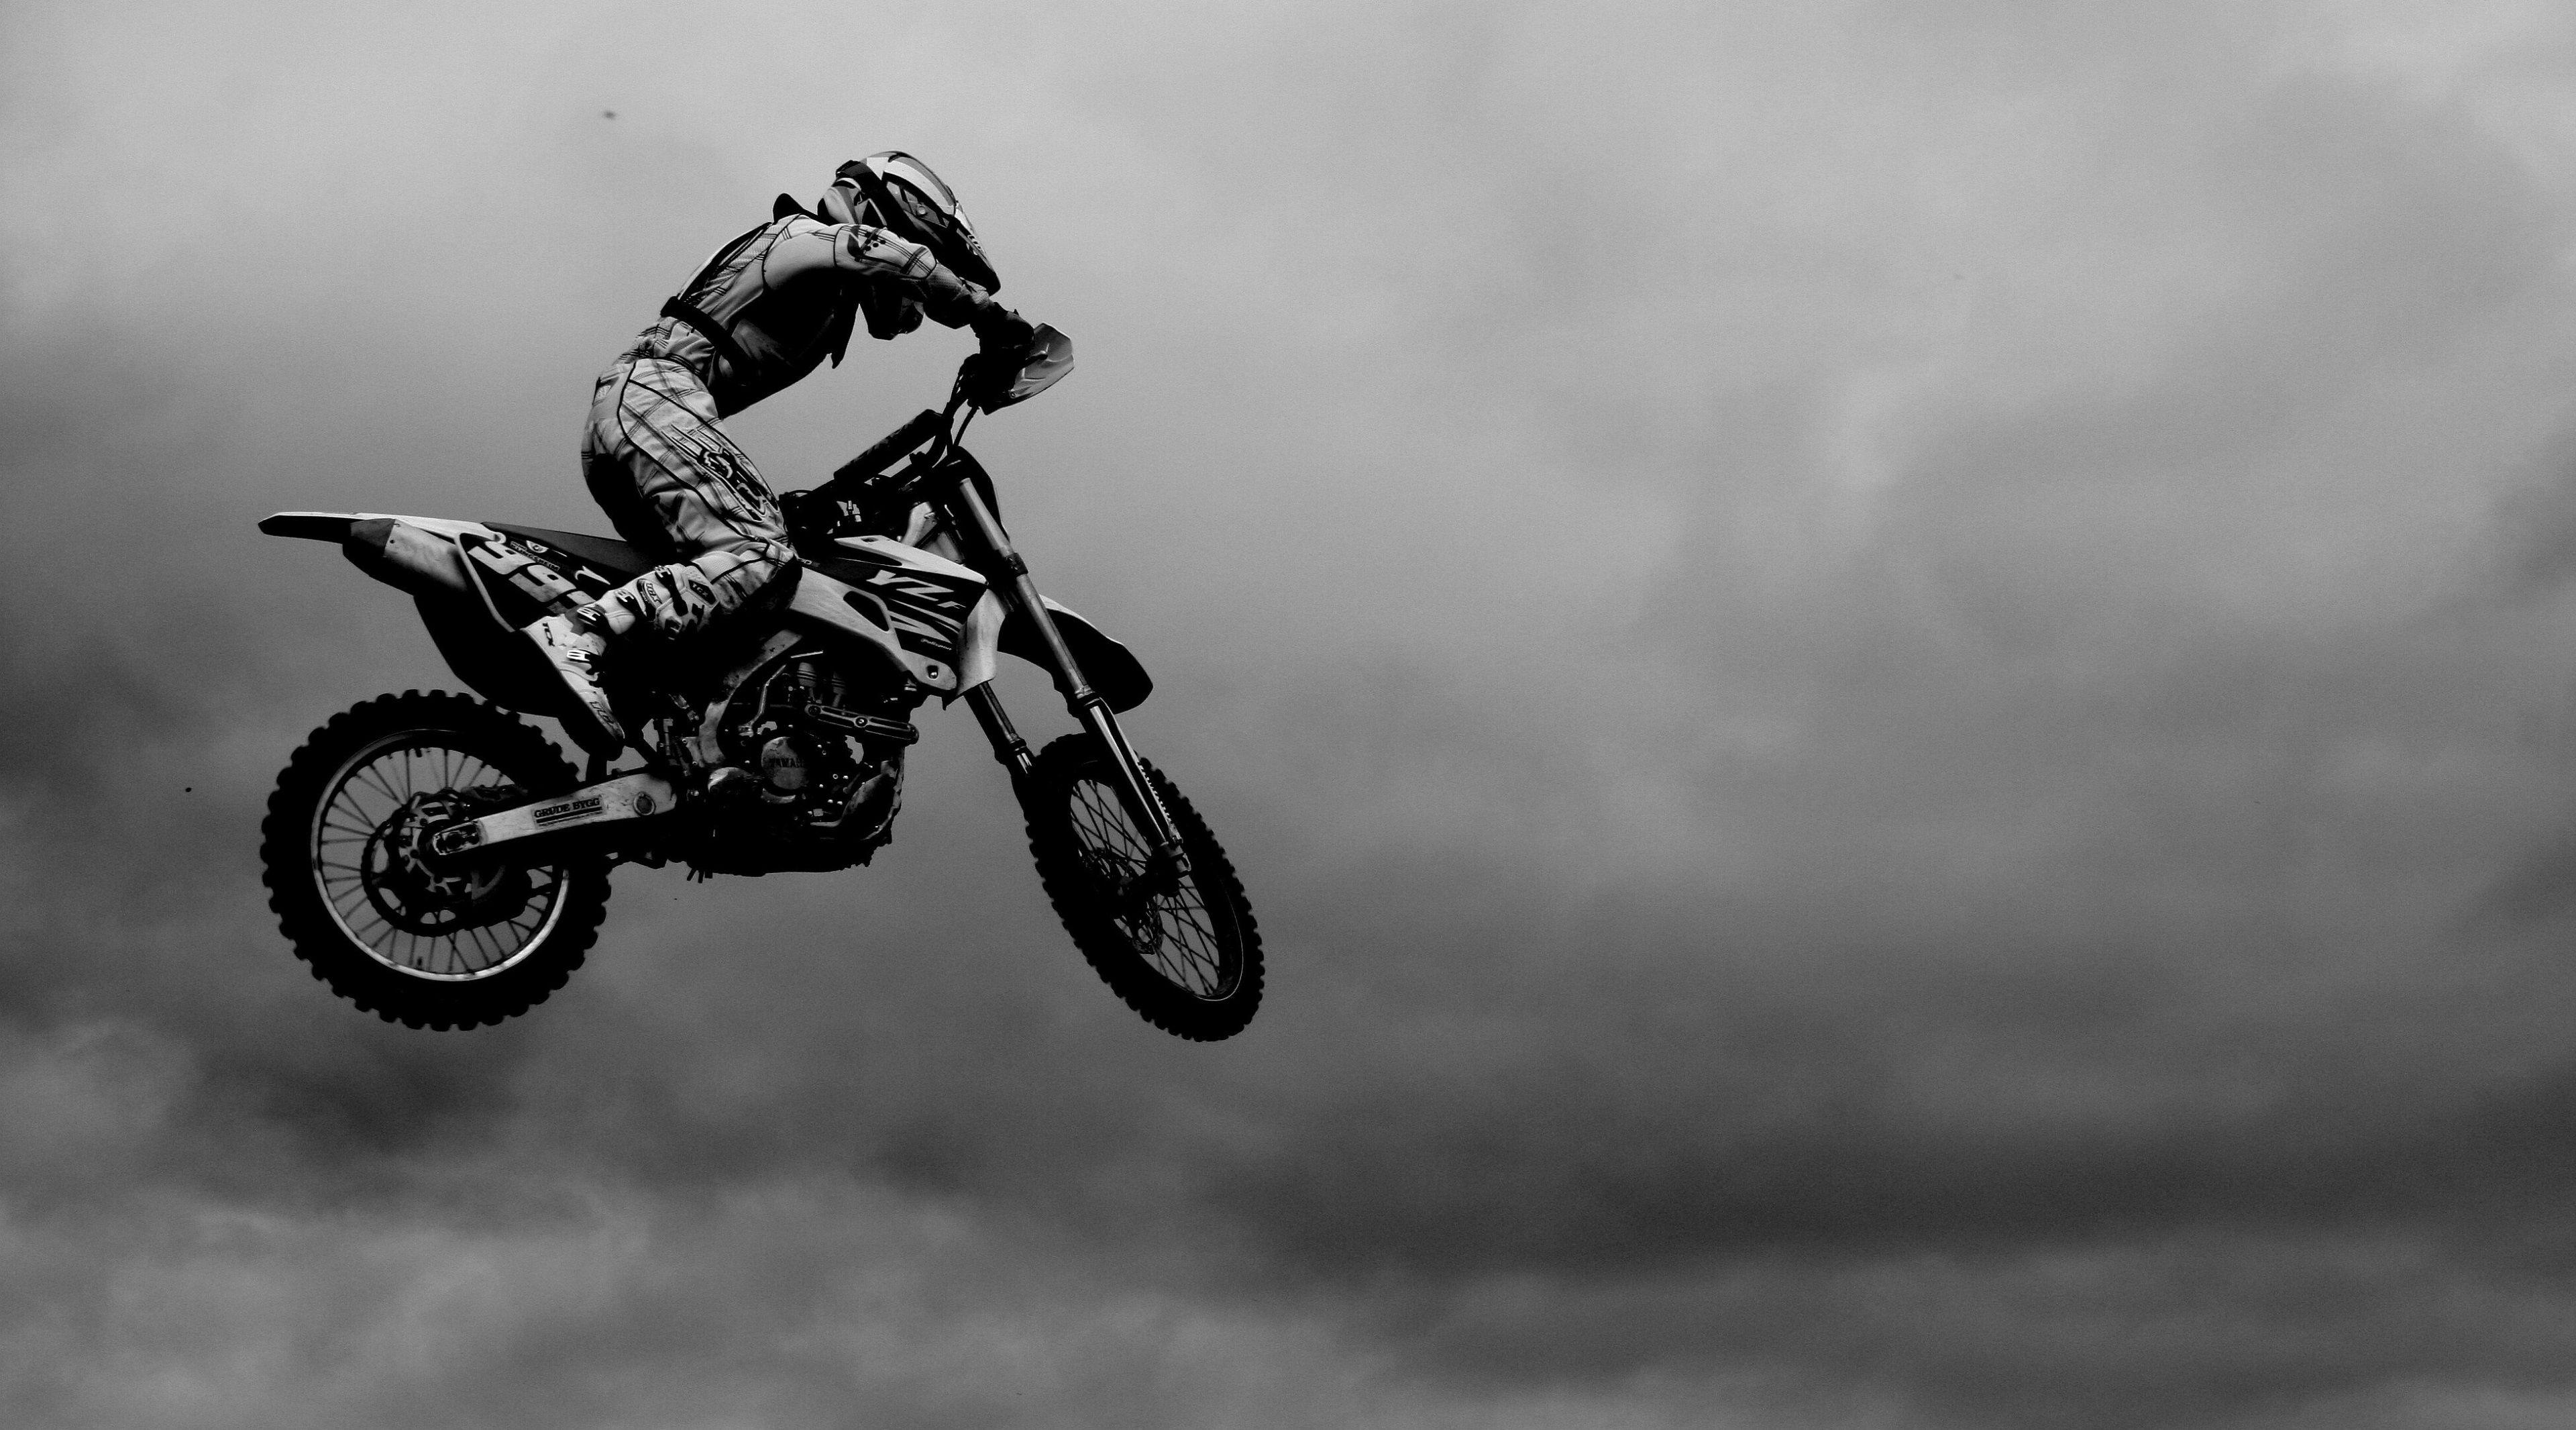 3840x2131 Motocross 4k Ultra Hd Desktop Wallpaper